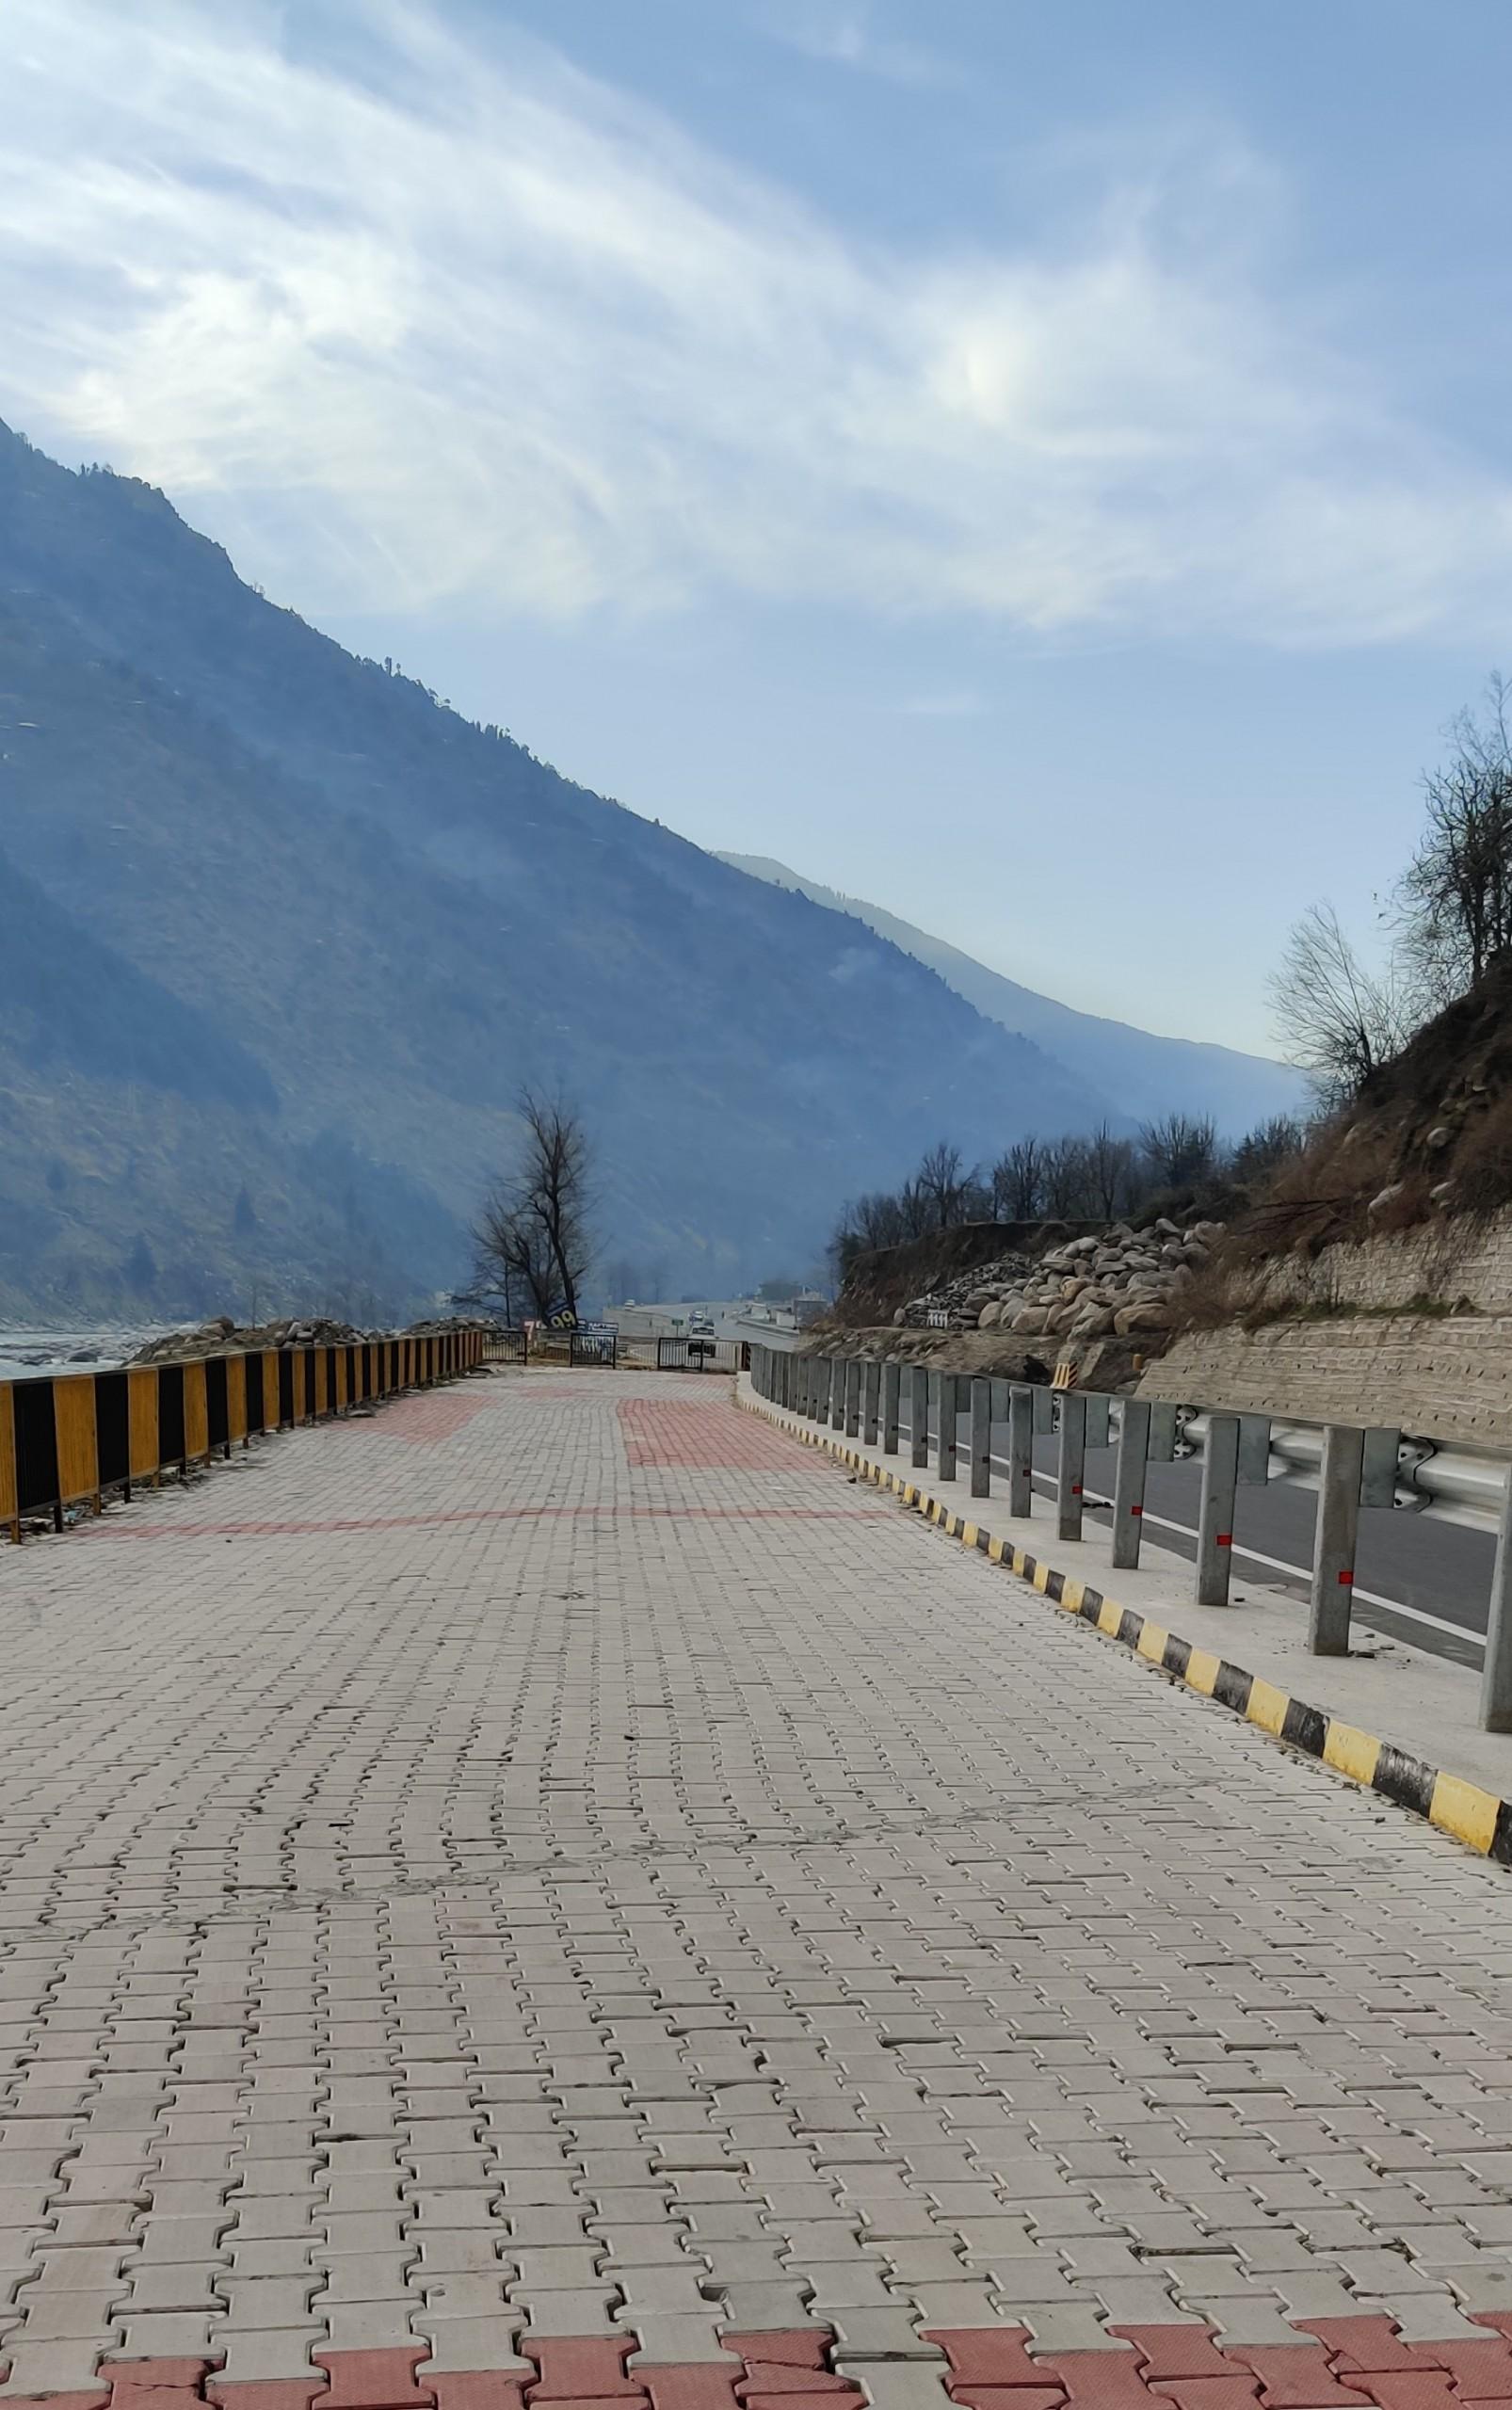 Walkway beside highway